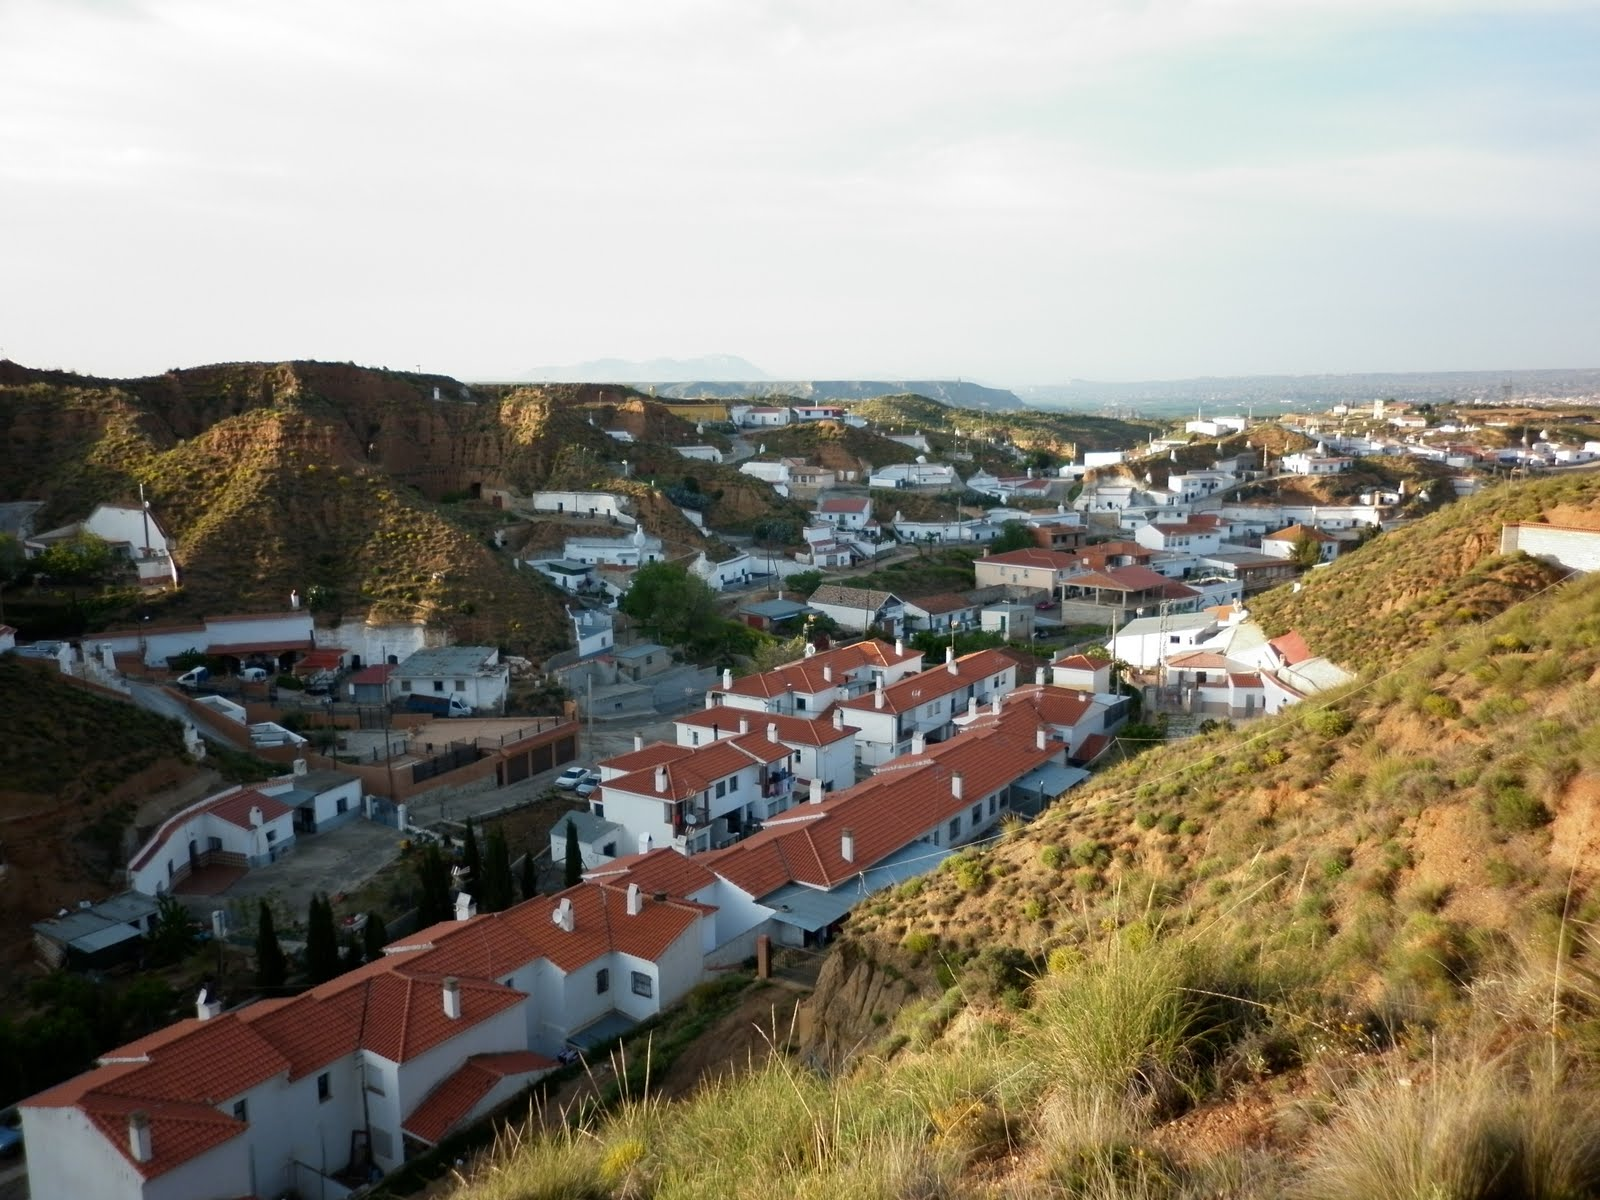 Baños De Graena | Bodega Cauzon Vinos Naturales Bodega Cauzon Y Graena